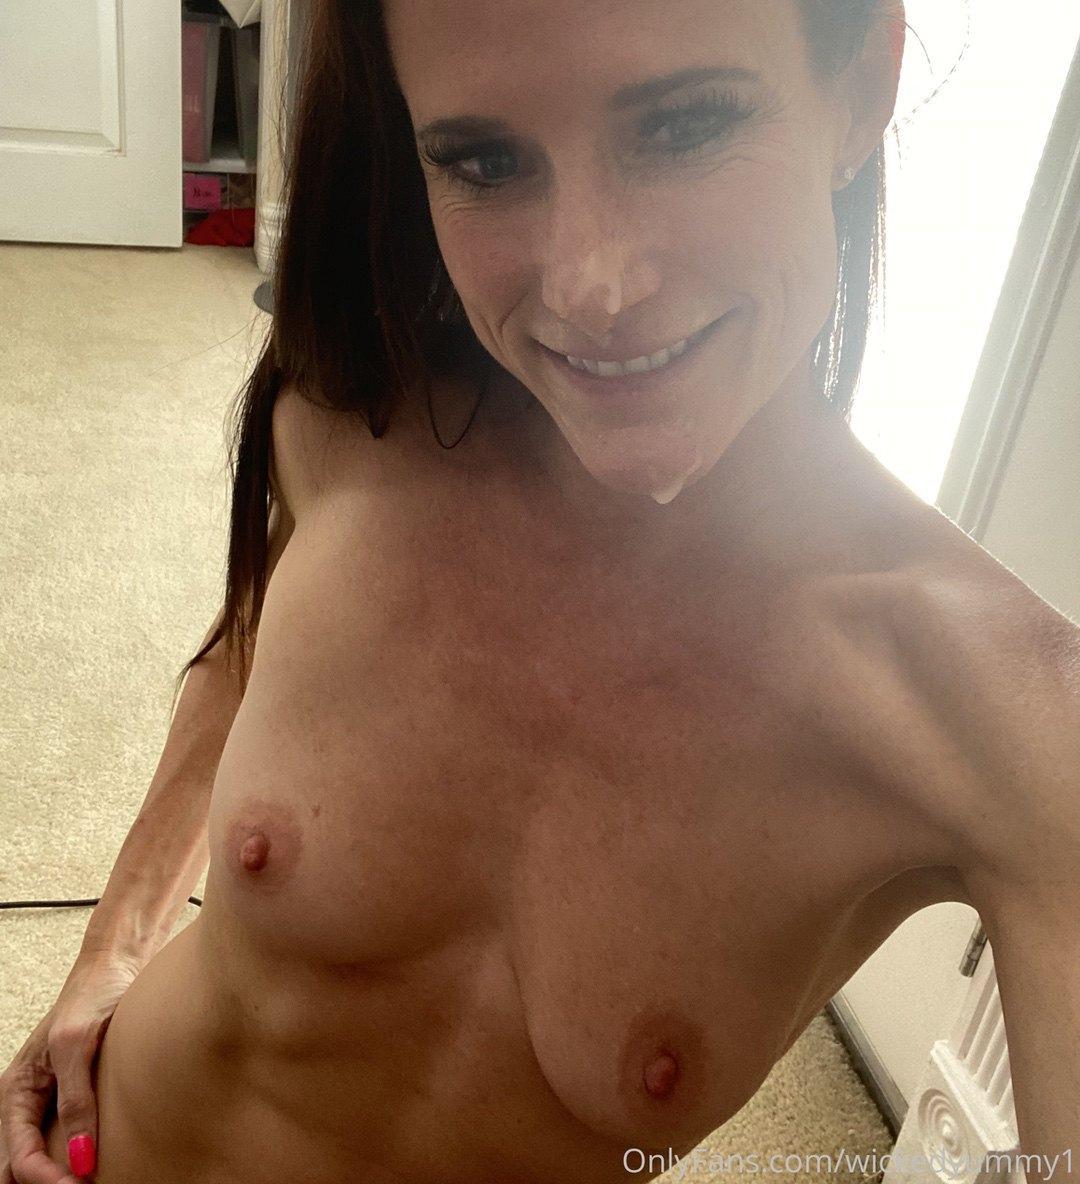 Sofie Marie Wickedyummy1 Onlyfans Nudes Leaks 0004